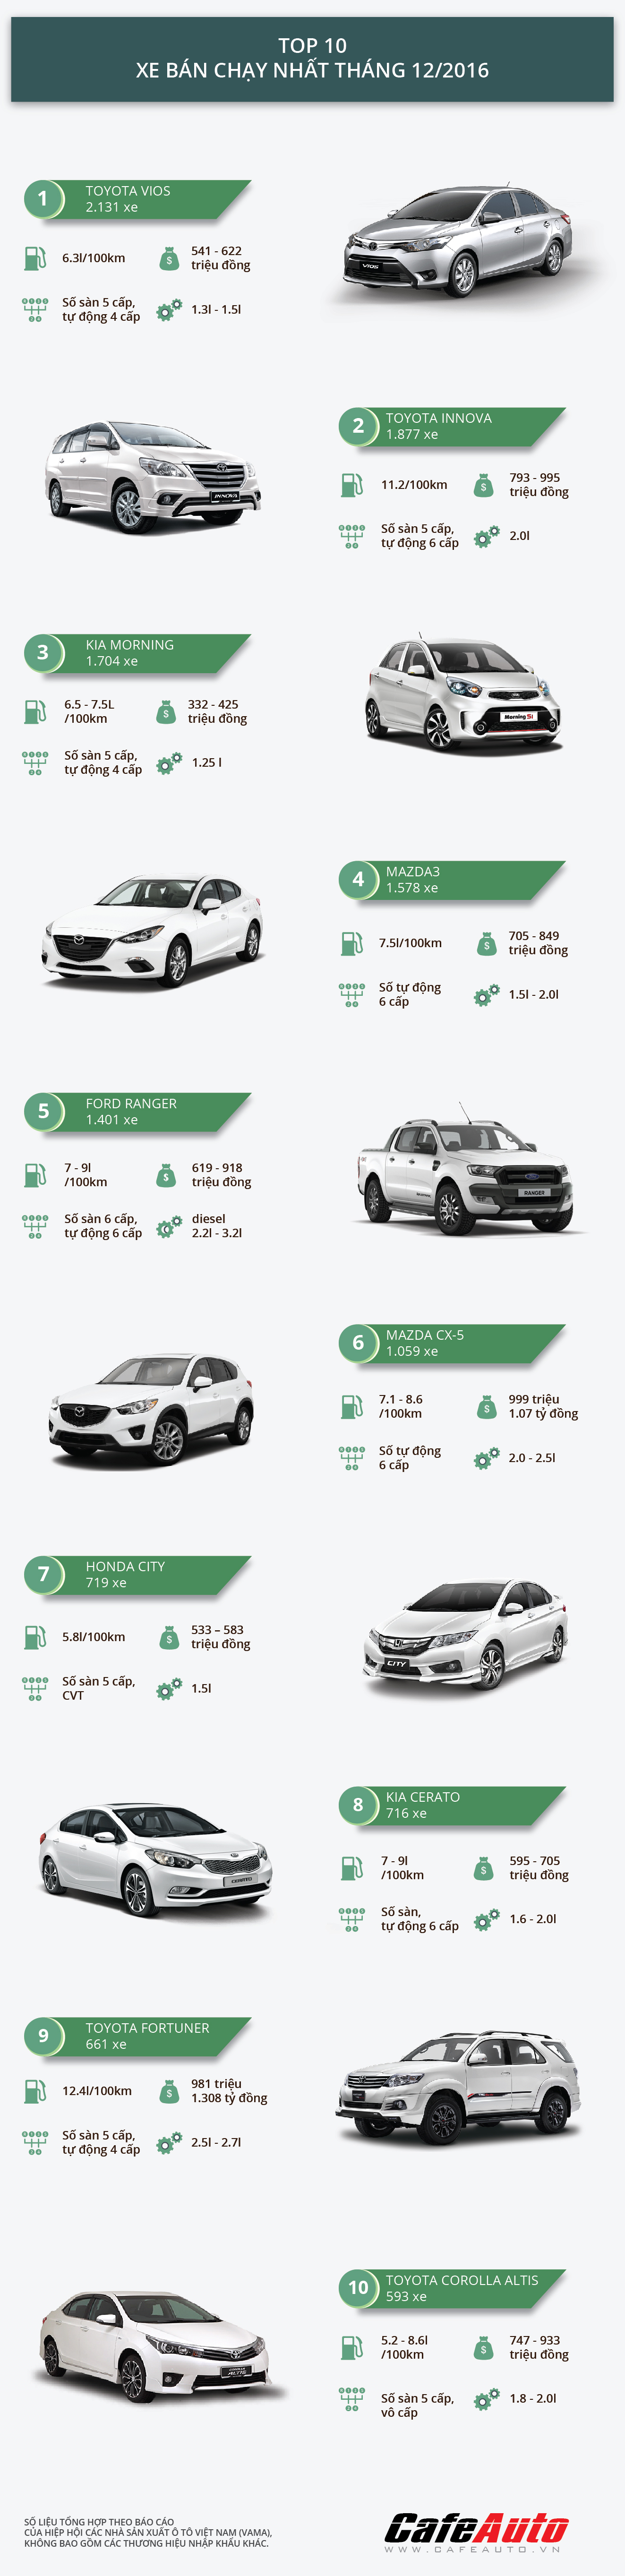 top-10-xe-ban-chay-nhat-thang-12-2016